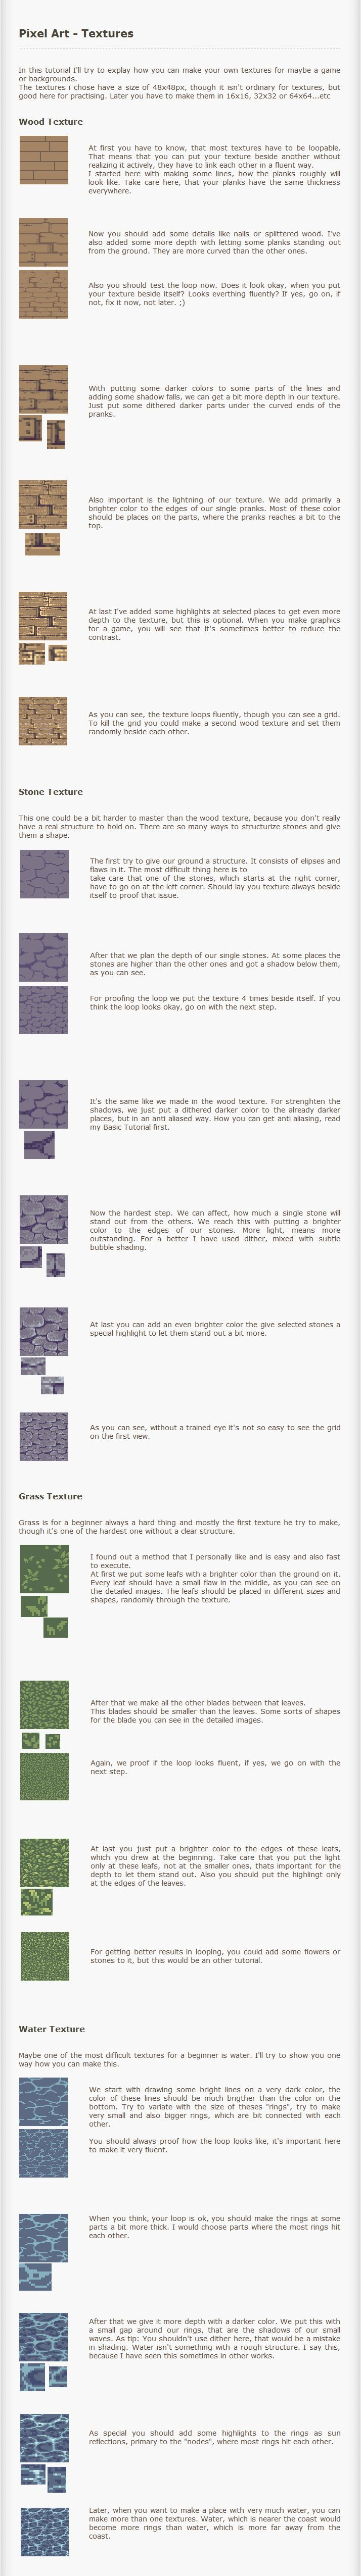 http://kiwinuptuo.deviantart.com/art/Pixel-Art-Tutorial-Textures-203459613